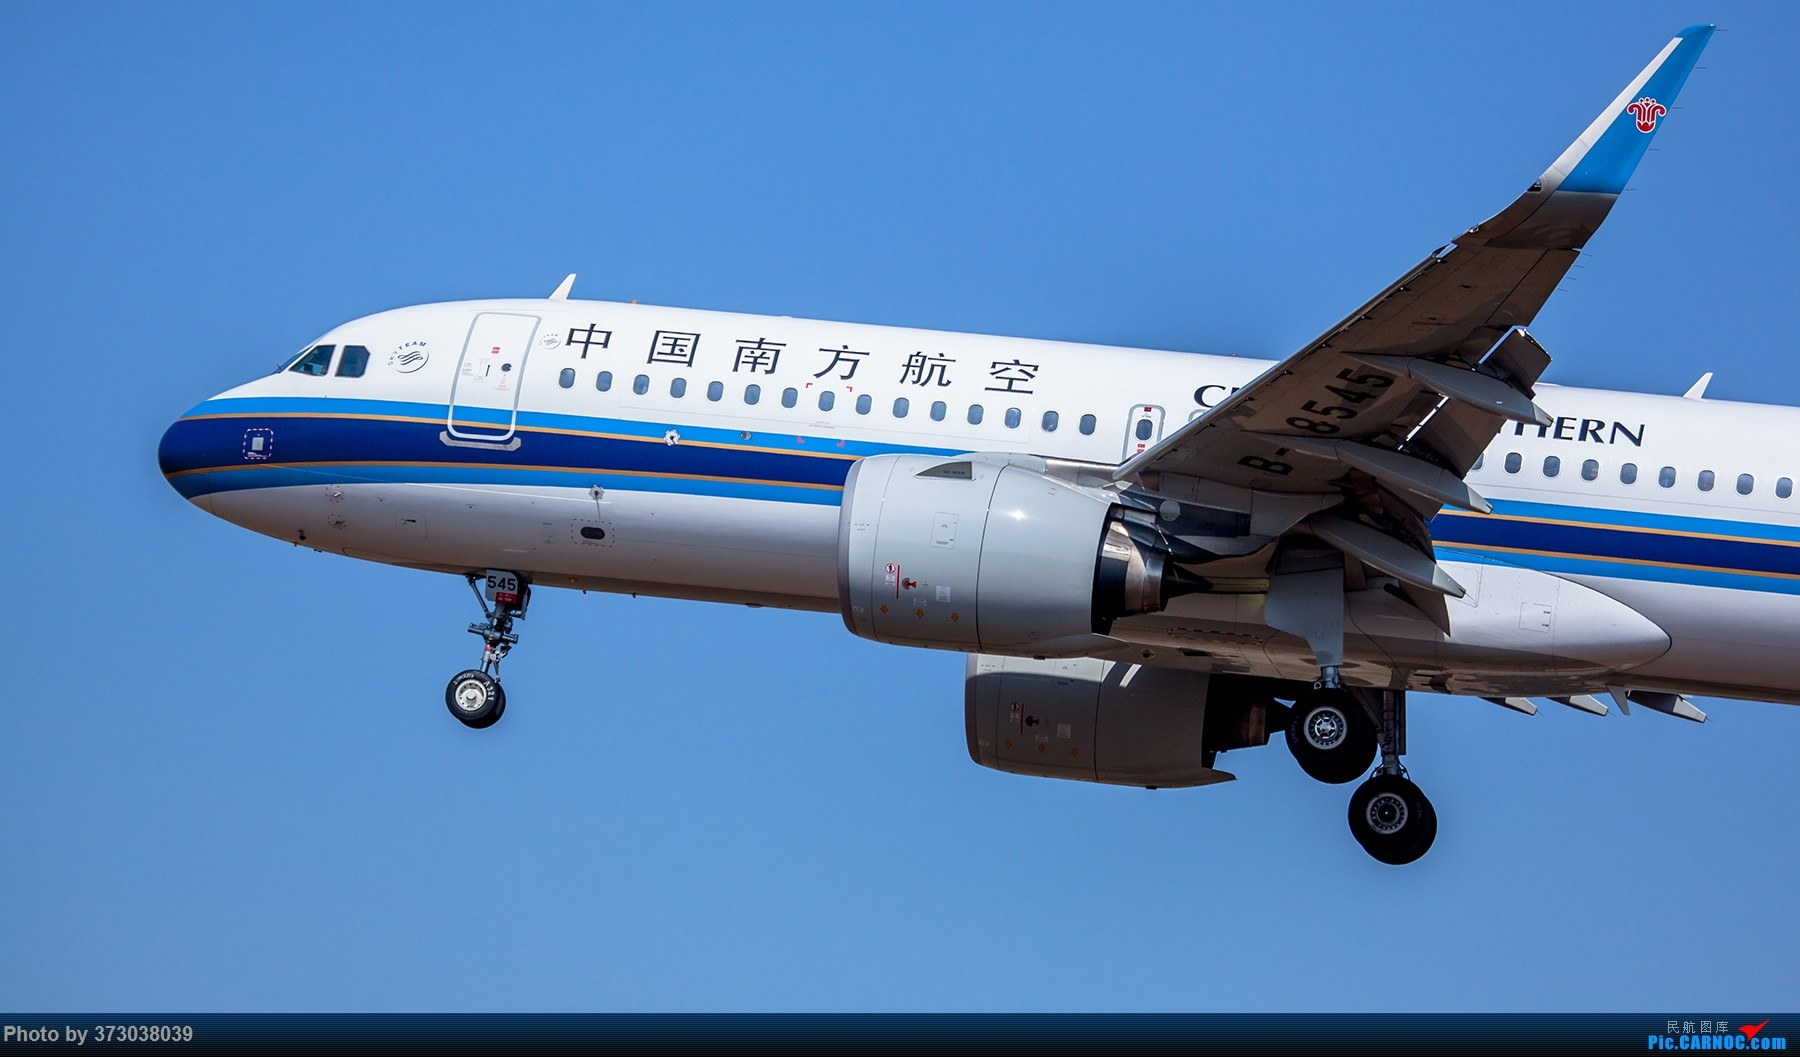 Re:[原创]【杭州飞友会】妖风后的杭城通透蓝,荷航海航厦航787落地萧山机场 AIRBUS A320NEO B-8671 中国杭州萧山国际机场